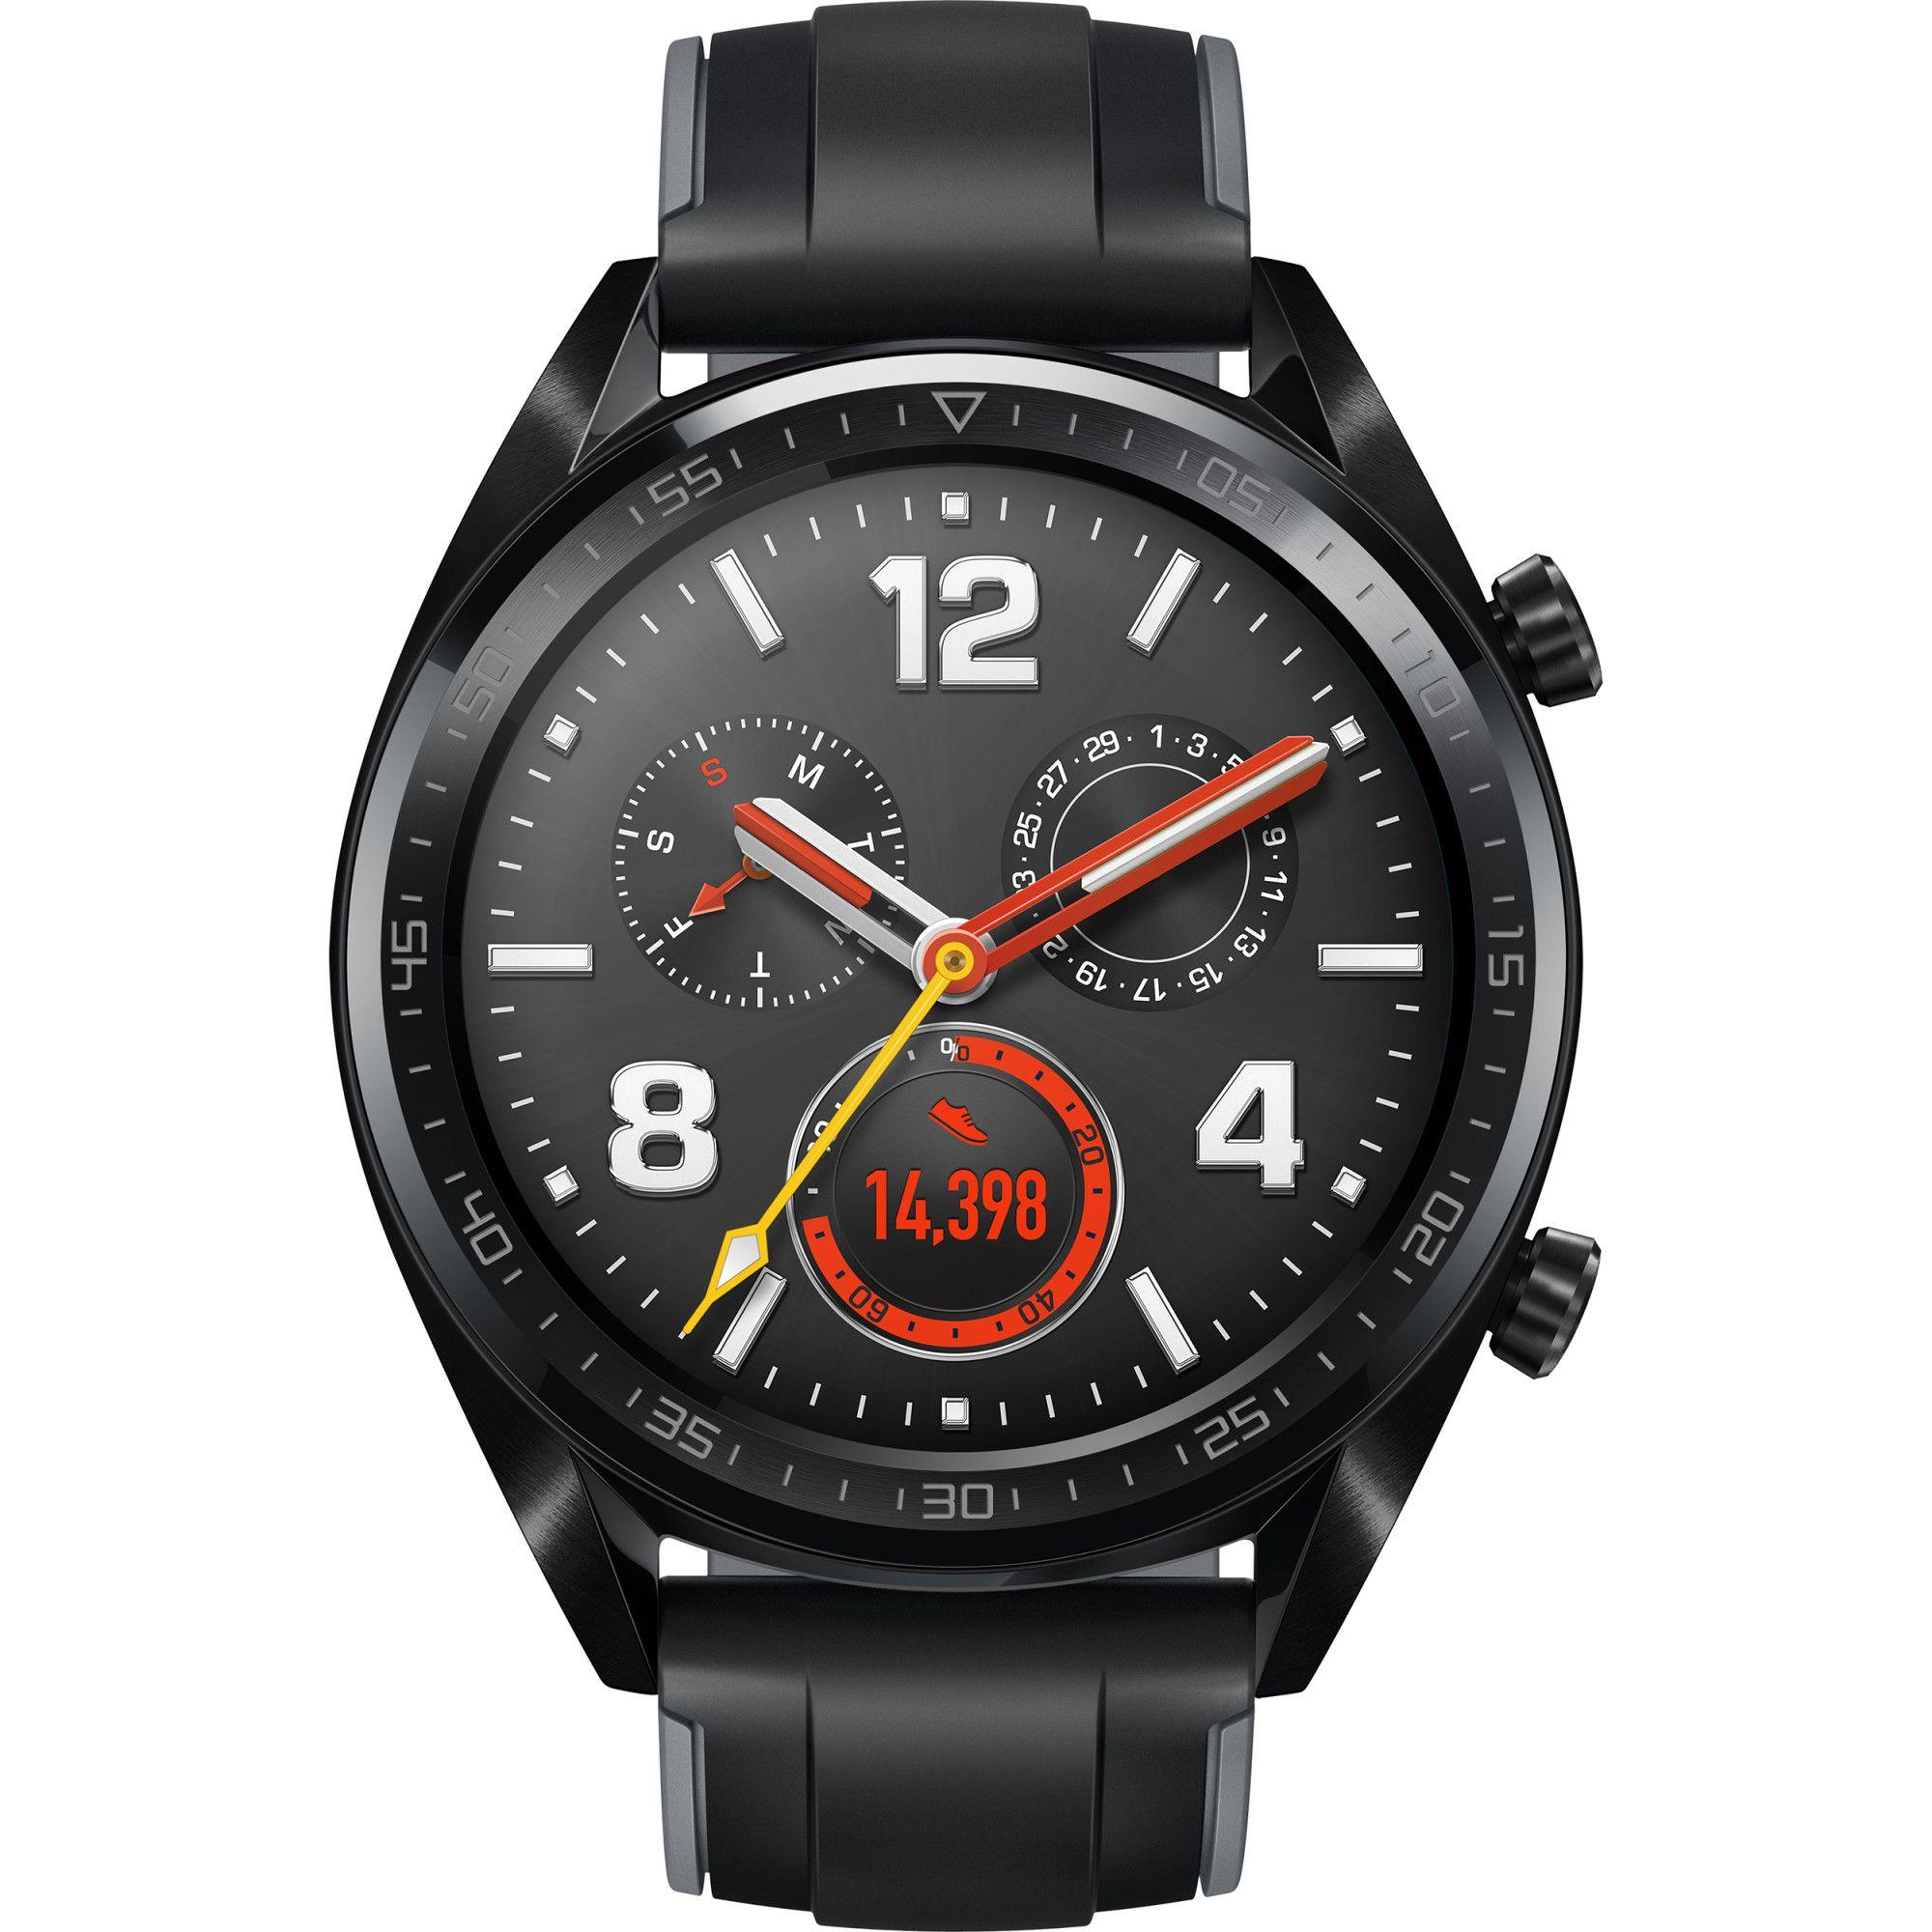 Huawei Watch GT smartwatch Black AMOLED 3.53 cm (1.39